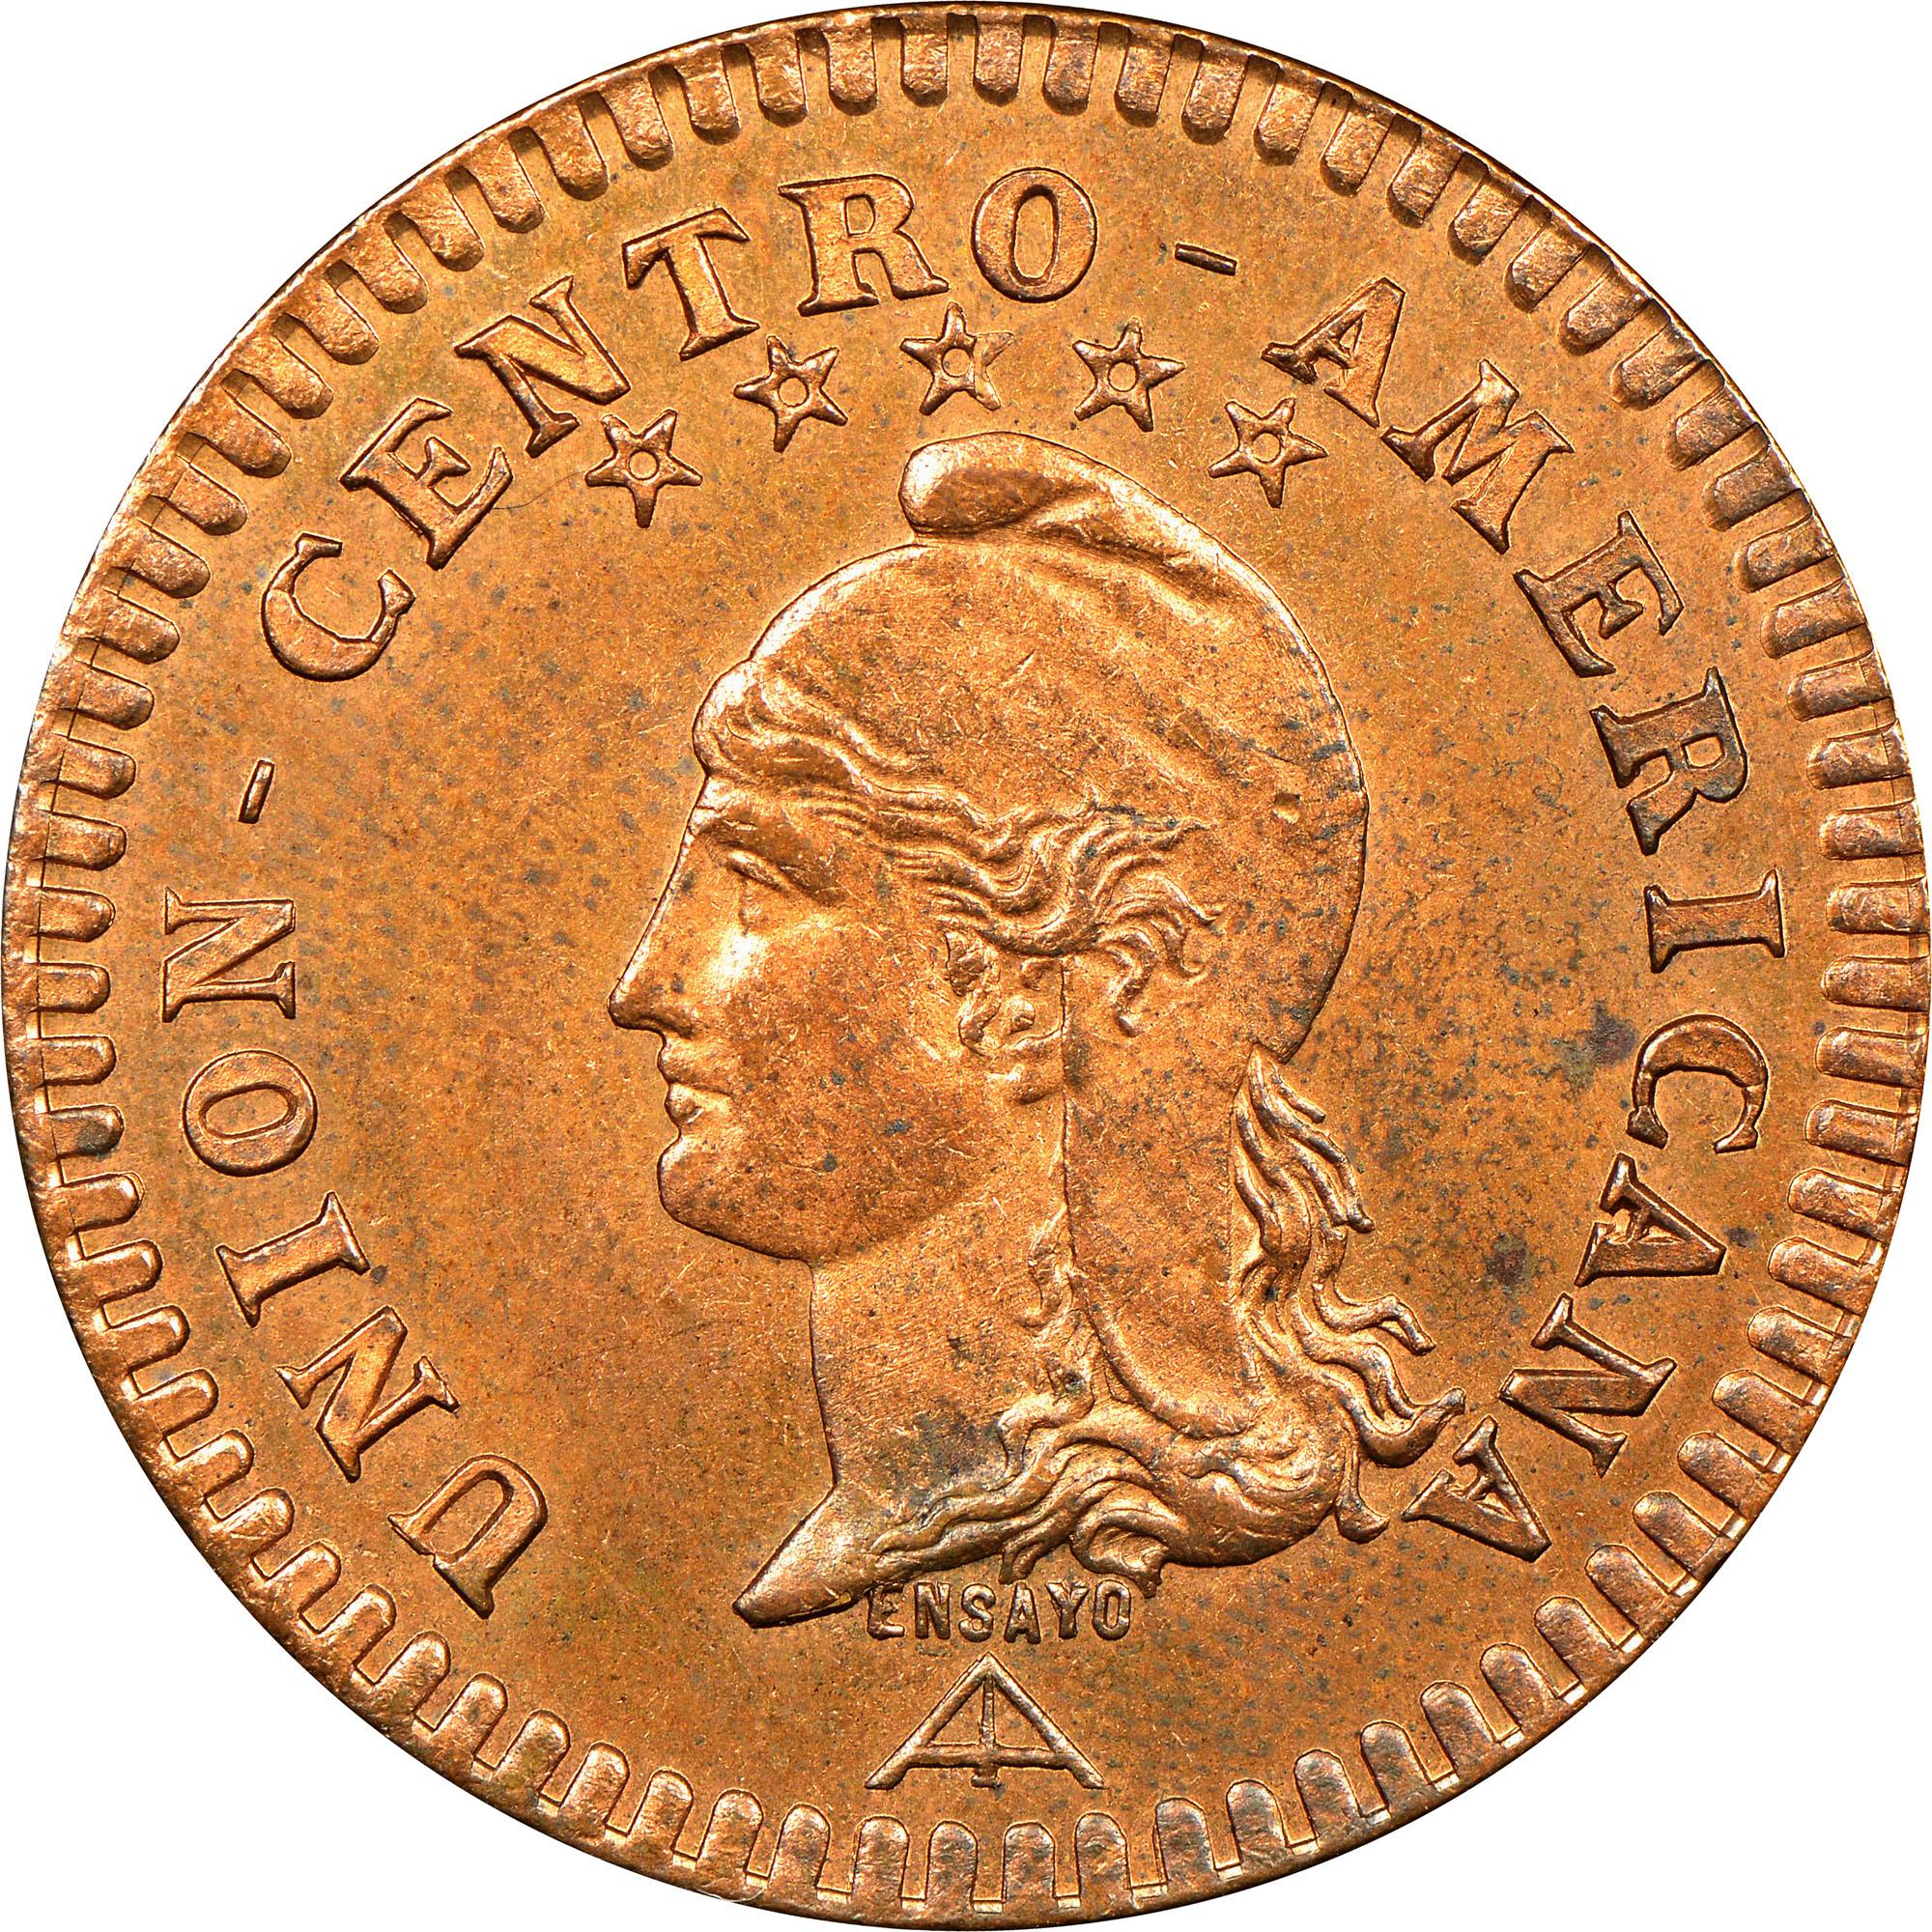 1889 Central American Union 2 Centavos obverse